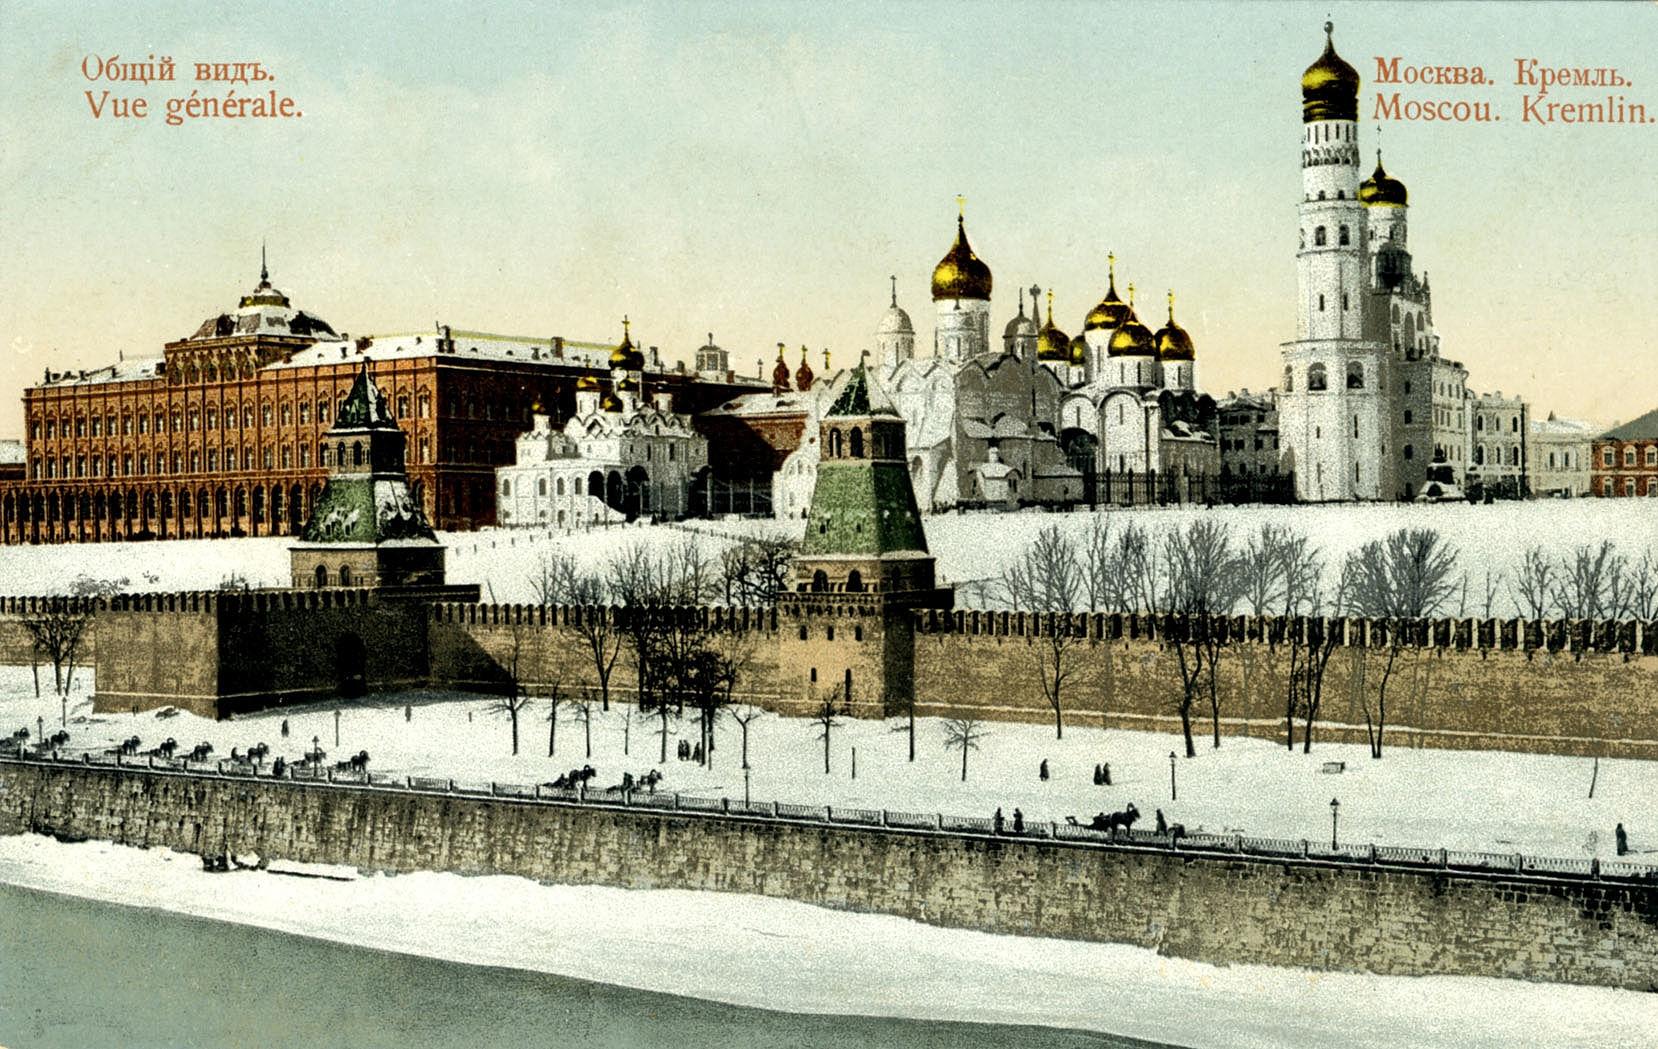 Кремль зимой. Общий вид